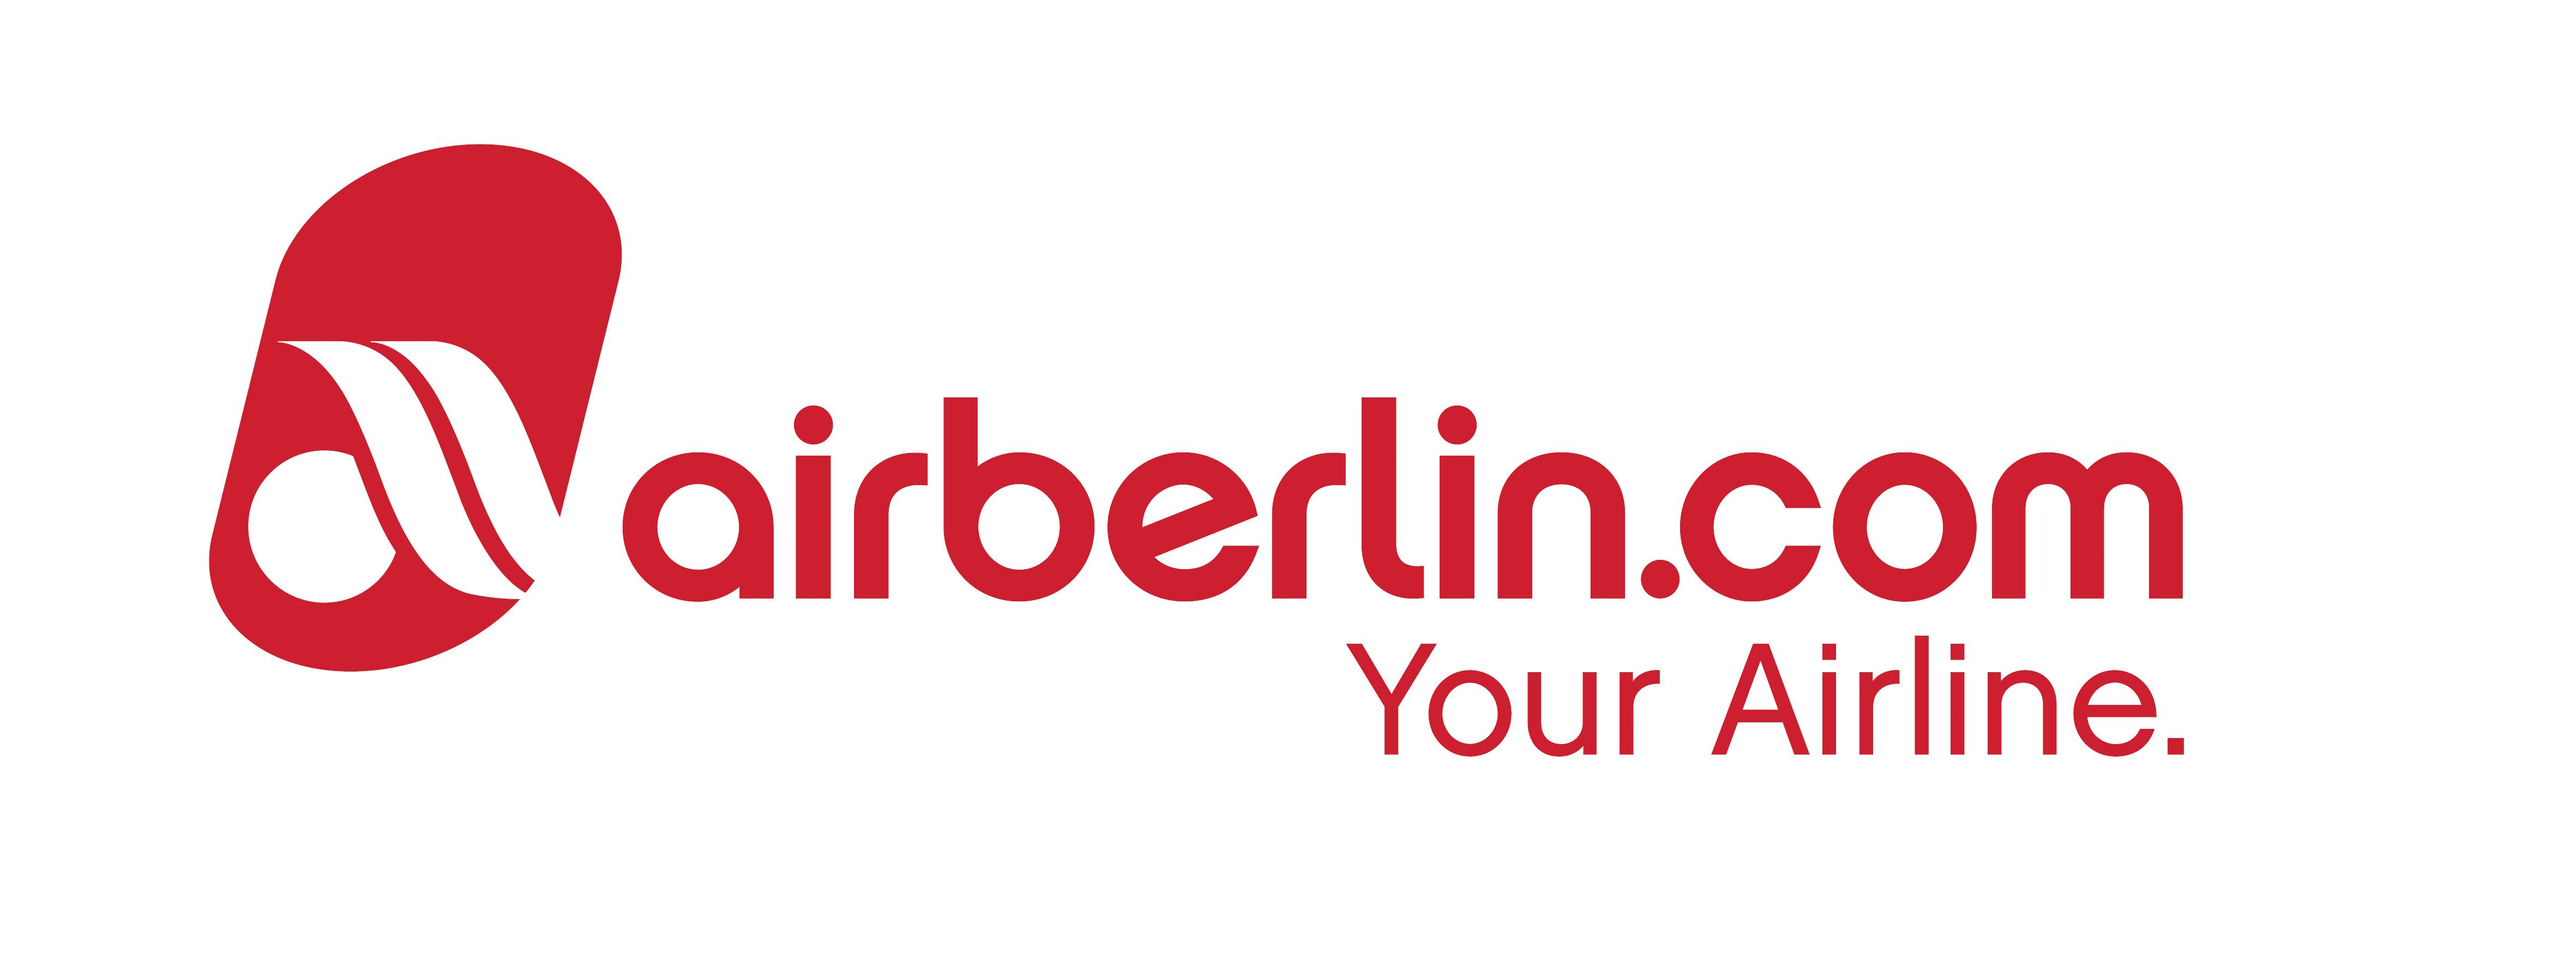 https://upload.wikimedia.org/wikipedia/commons/4/41/Logo_airberlin_com_2009.jpg